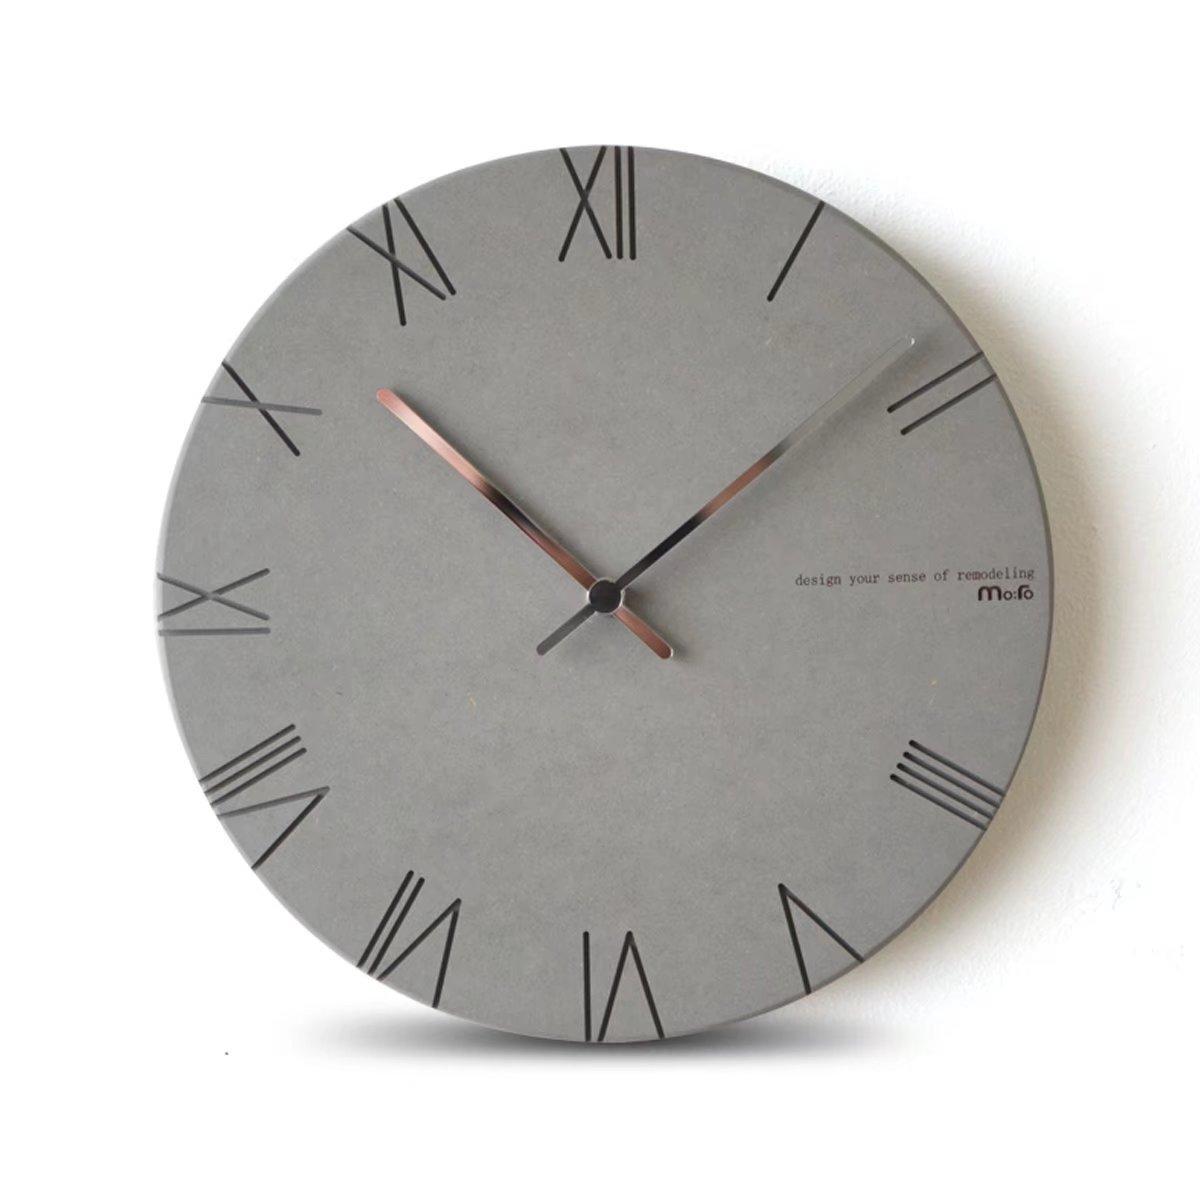 OSONA 欧式 ファッション 彫り 石英時計 シンプル デザイン 壁時計 壁掛け ホーム おしゃれ 掛け時計 デジタル インテリア 客間 無音 電池式 静音 wall clock リビング グレー B0719TMM7Jグレー